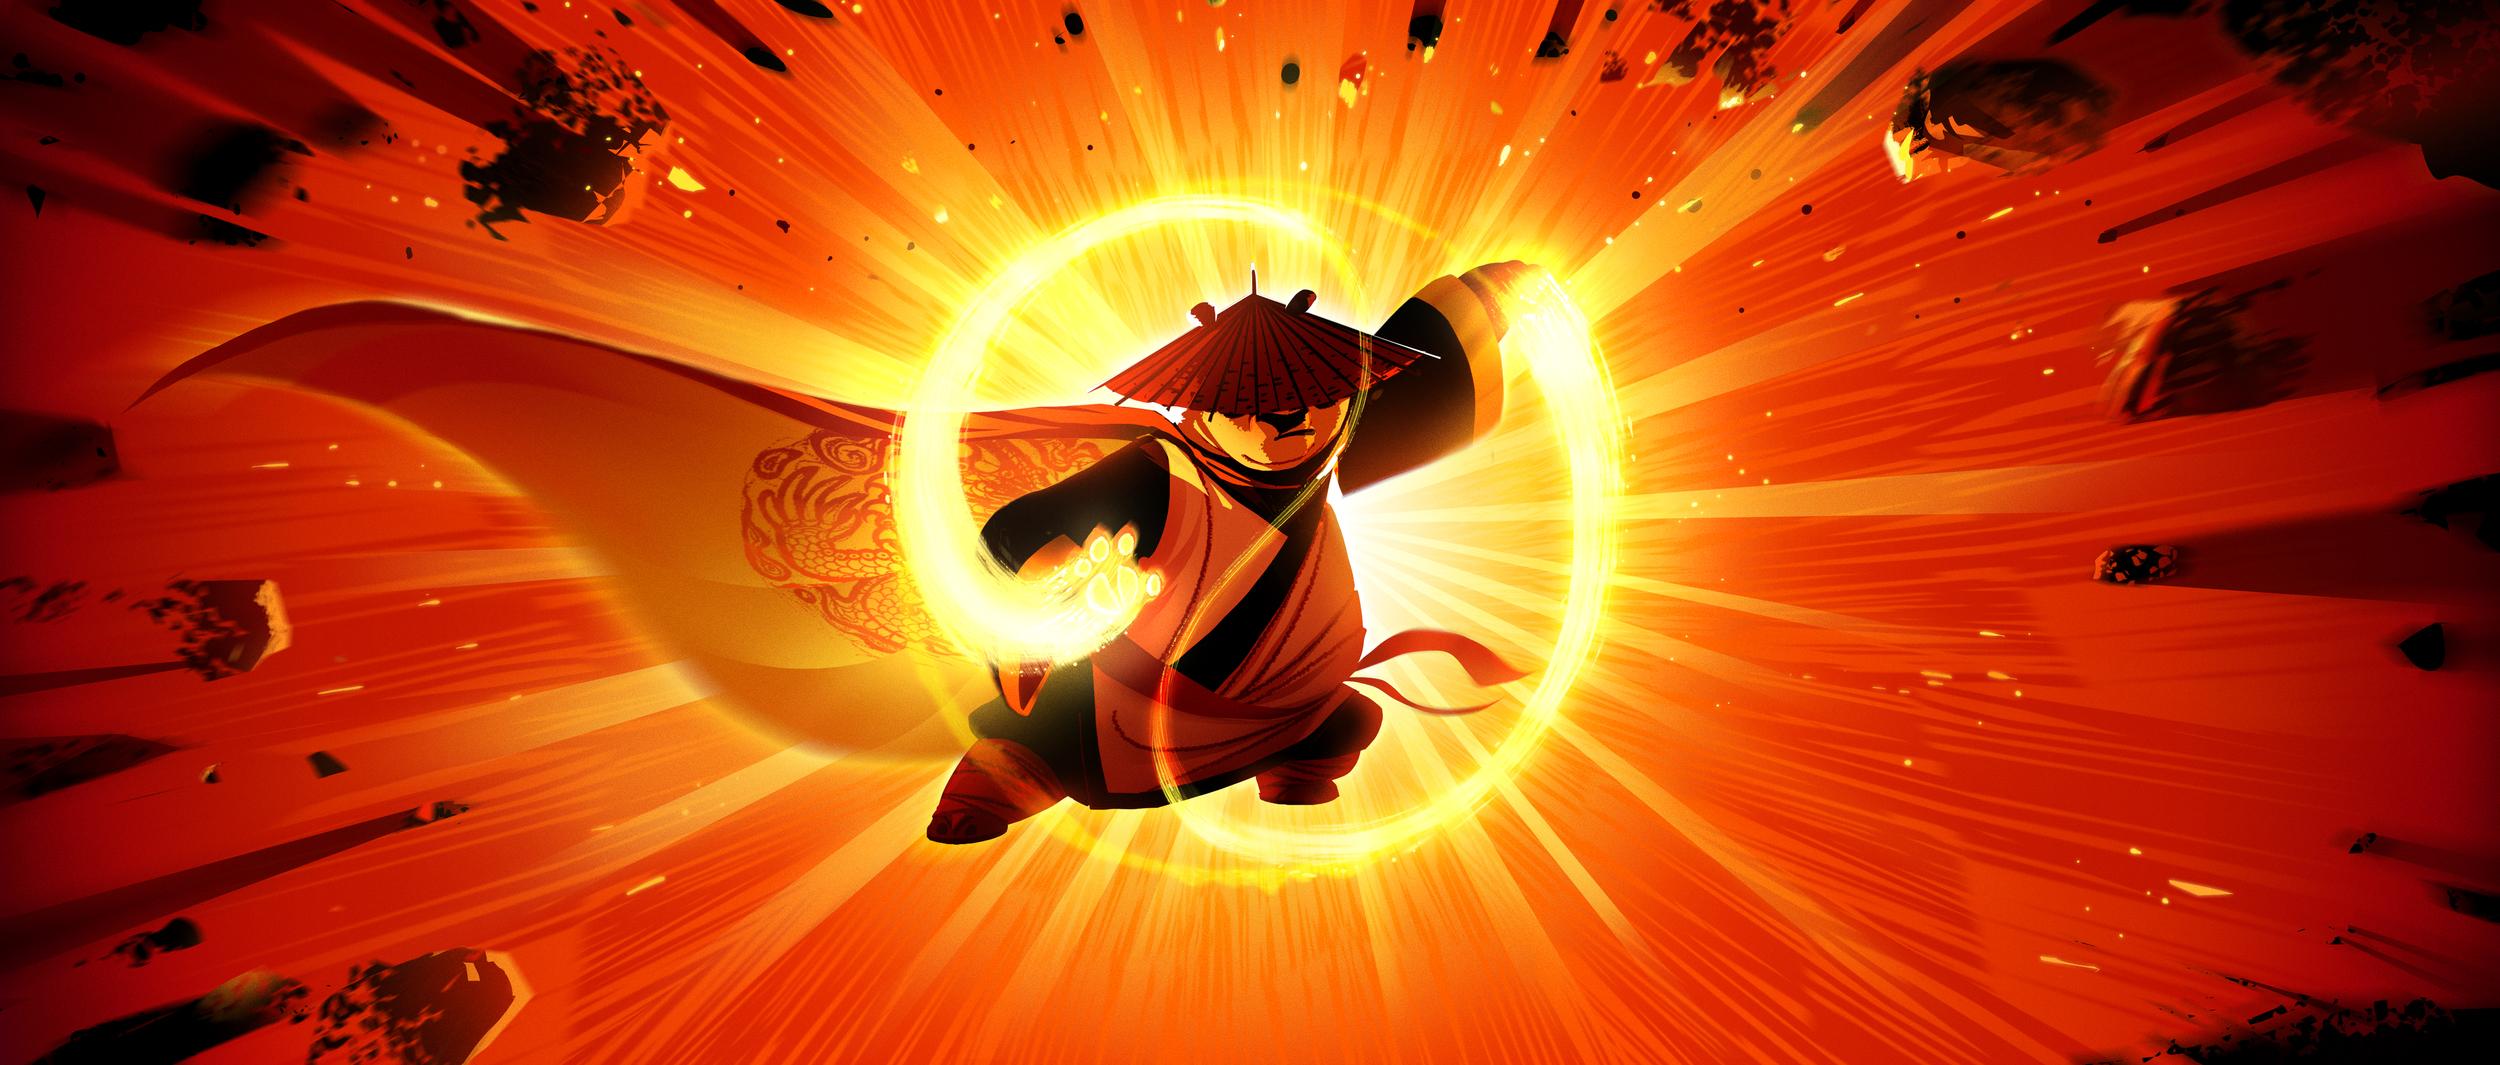 Kung Fu Panda 3, DWA Concept painting - Dragon Warrior